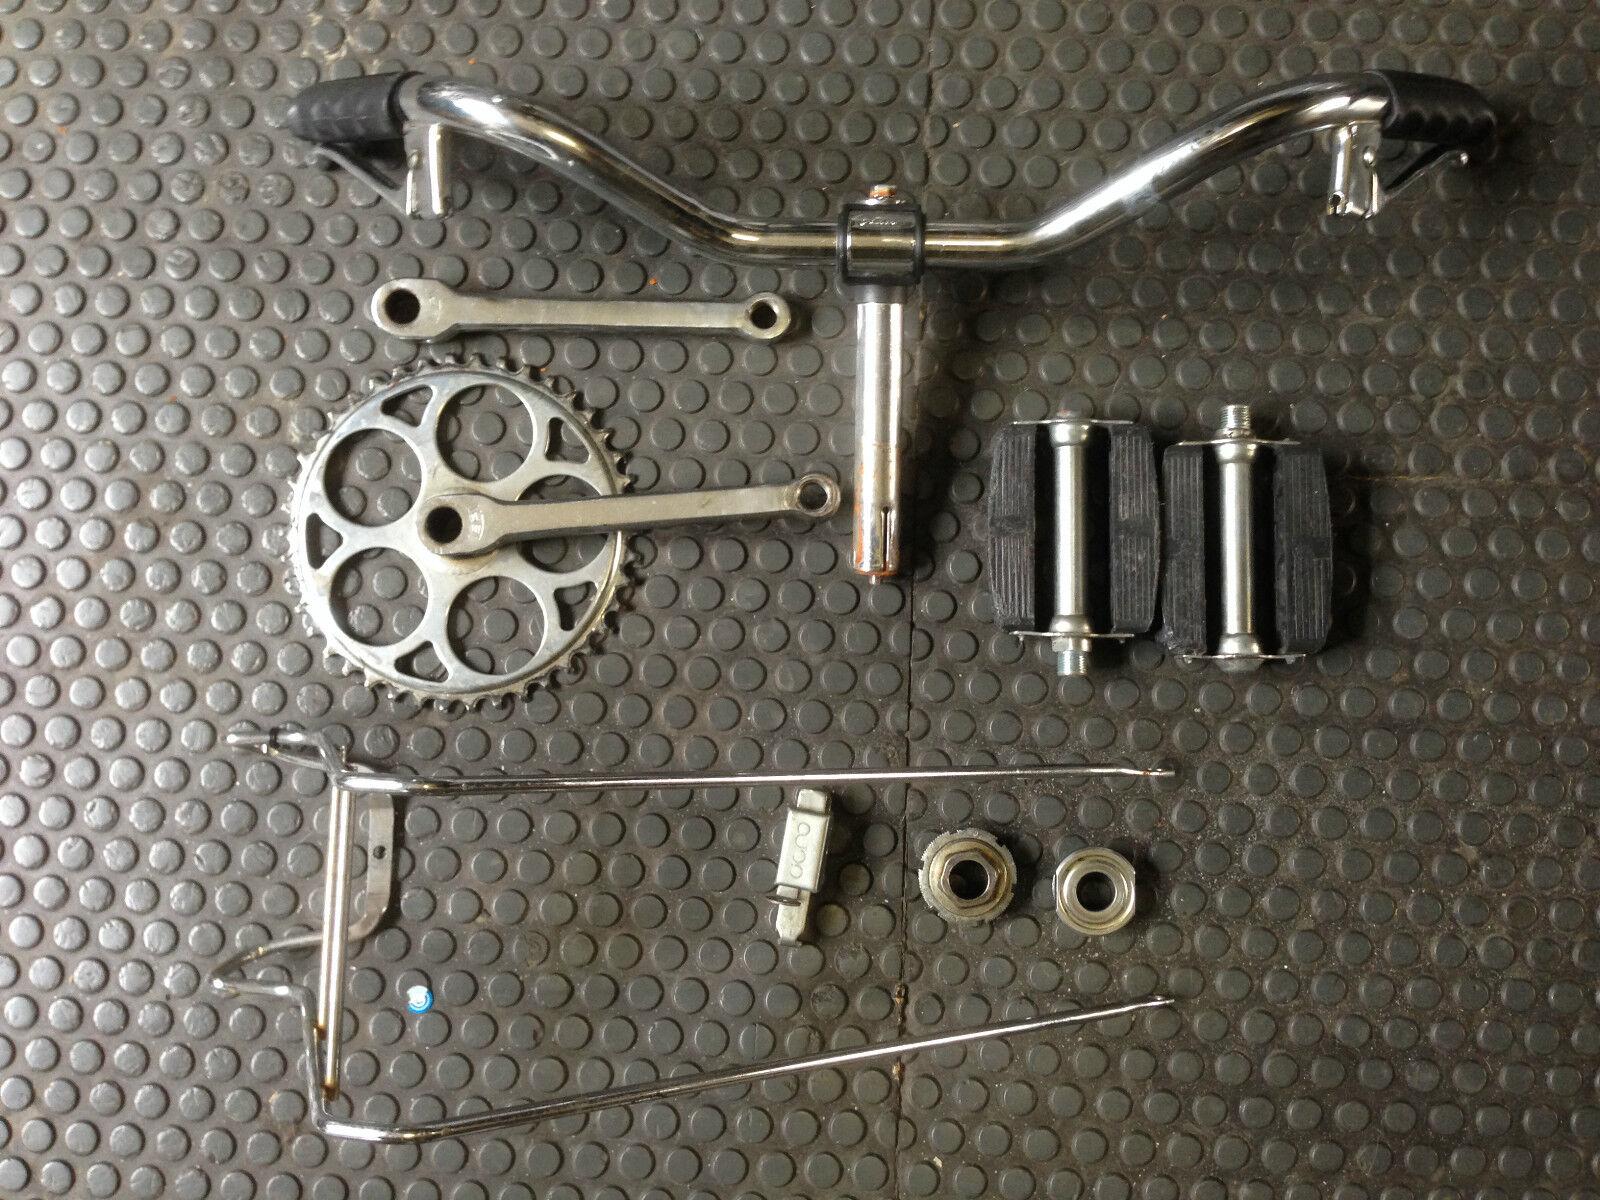 Lotto stock ricambi materiale vario bicicletta,Leri ,Cigno,Varese restauro